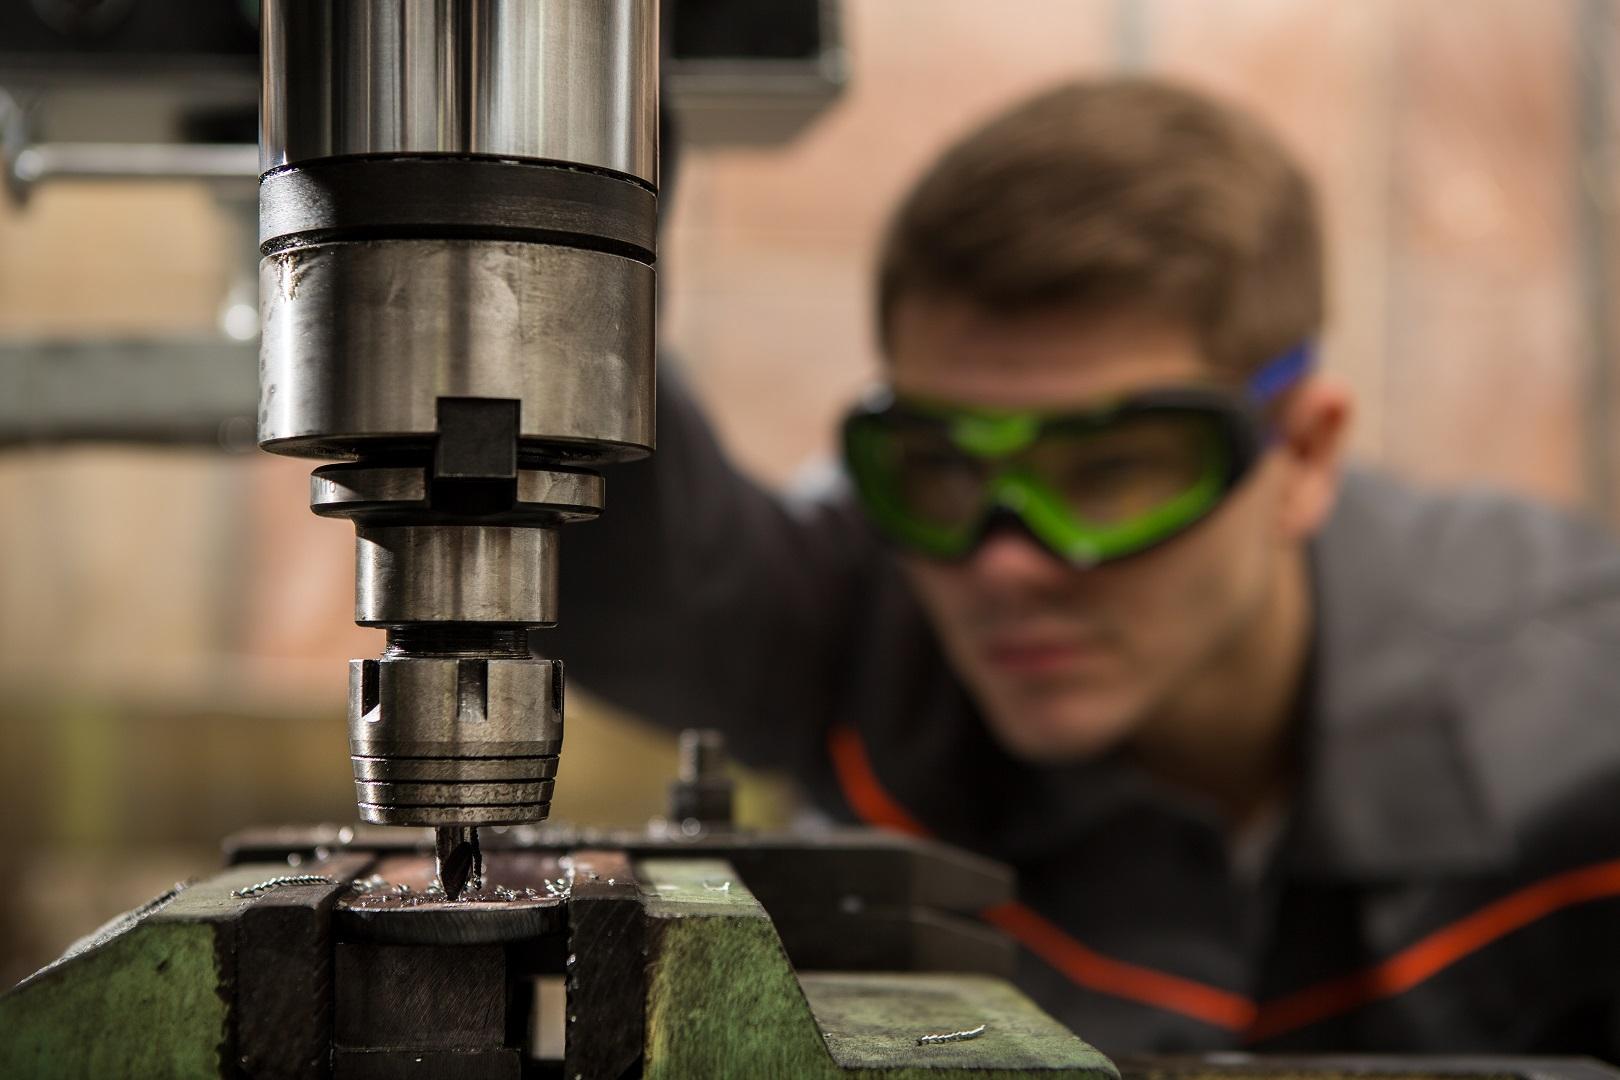 CNC Milling OperatorSM